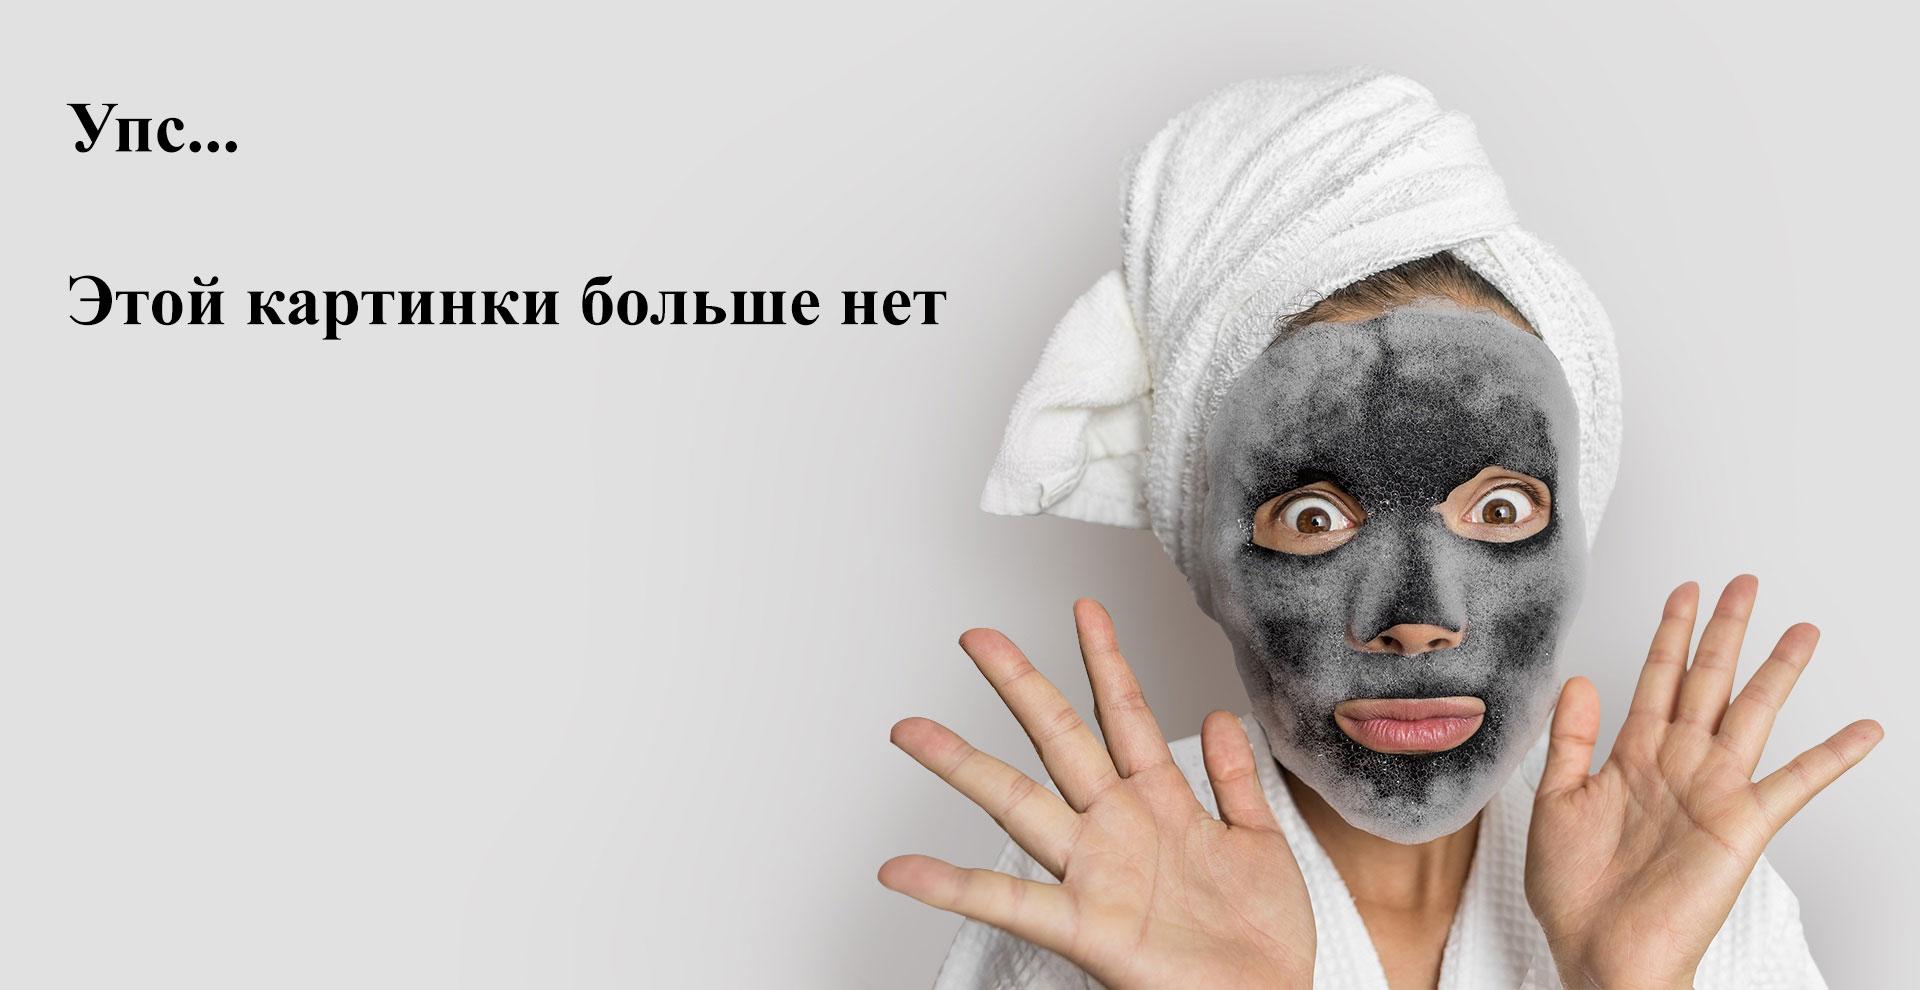 Patrisa Nail, Гель-лак Московская сага №740